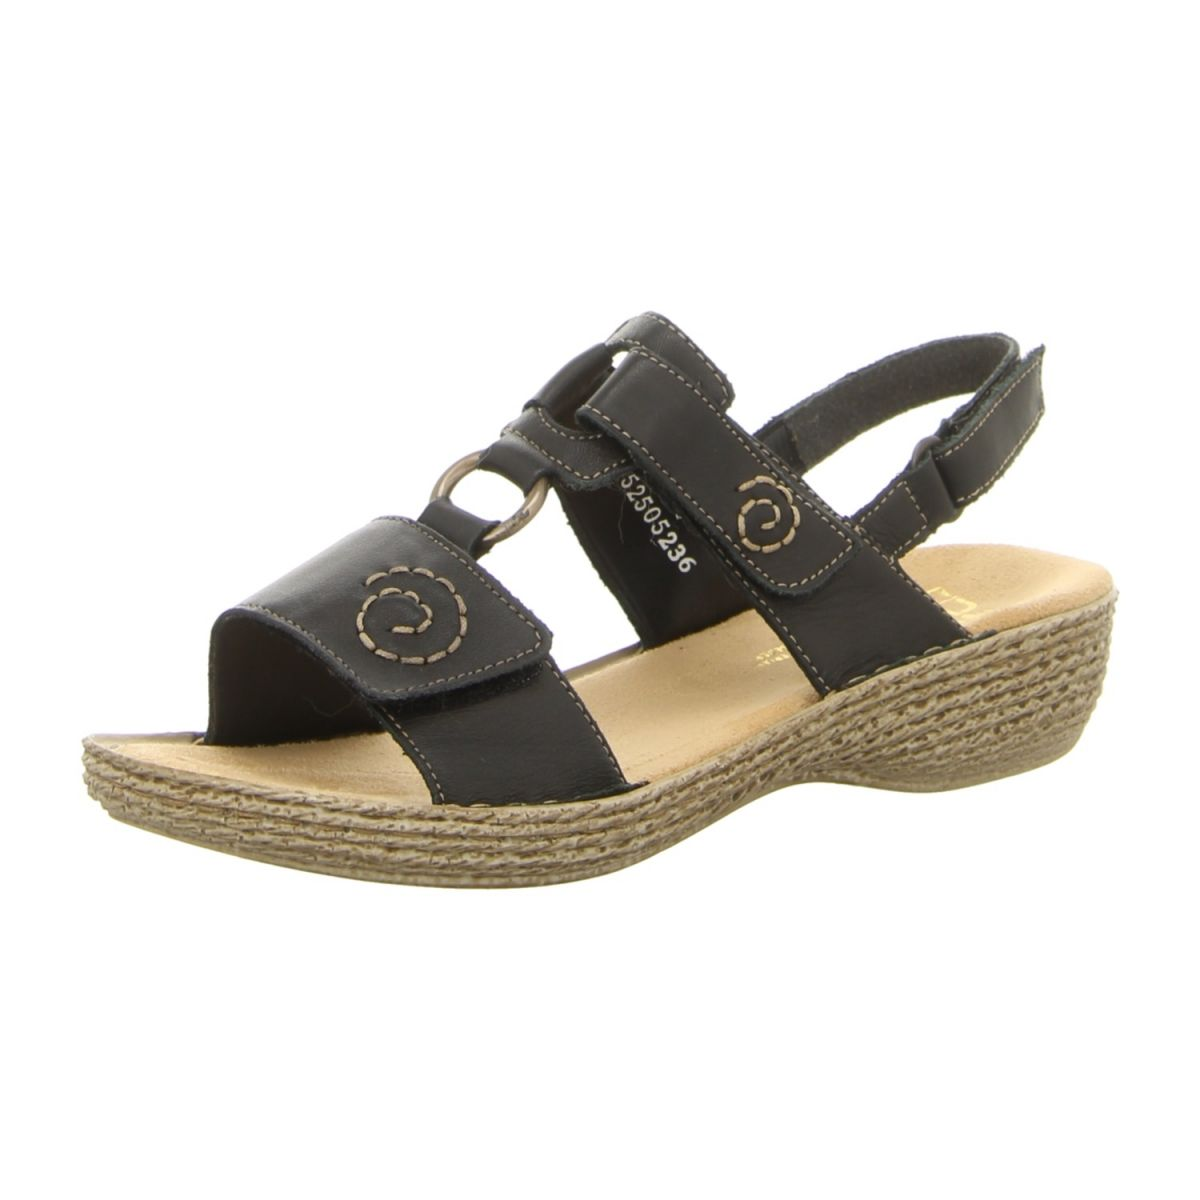 Rieker Schuhe Sandalette 65863 00 schwarz schwarz NEU